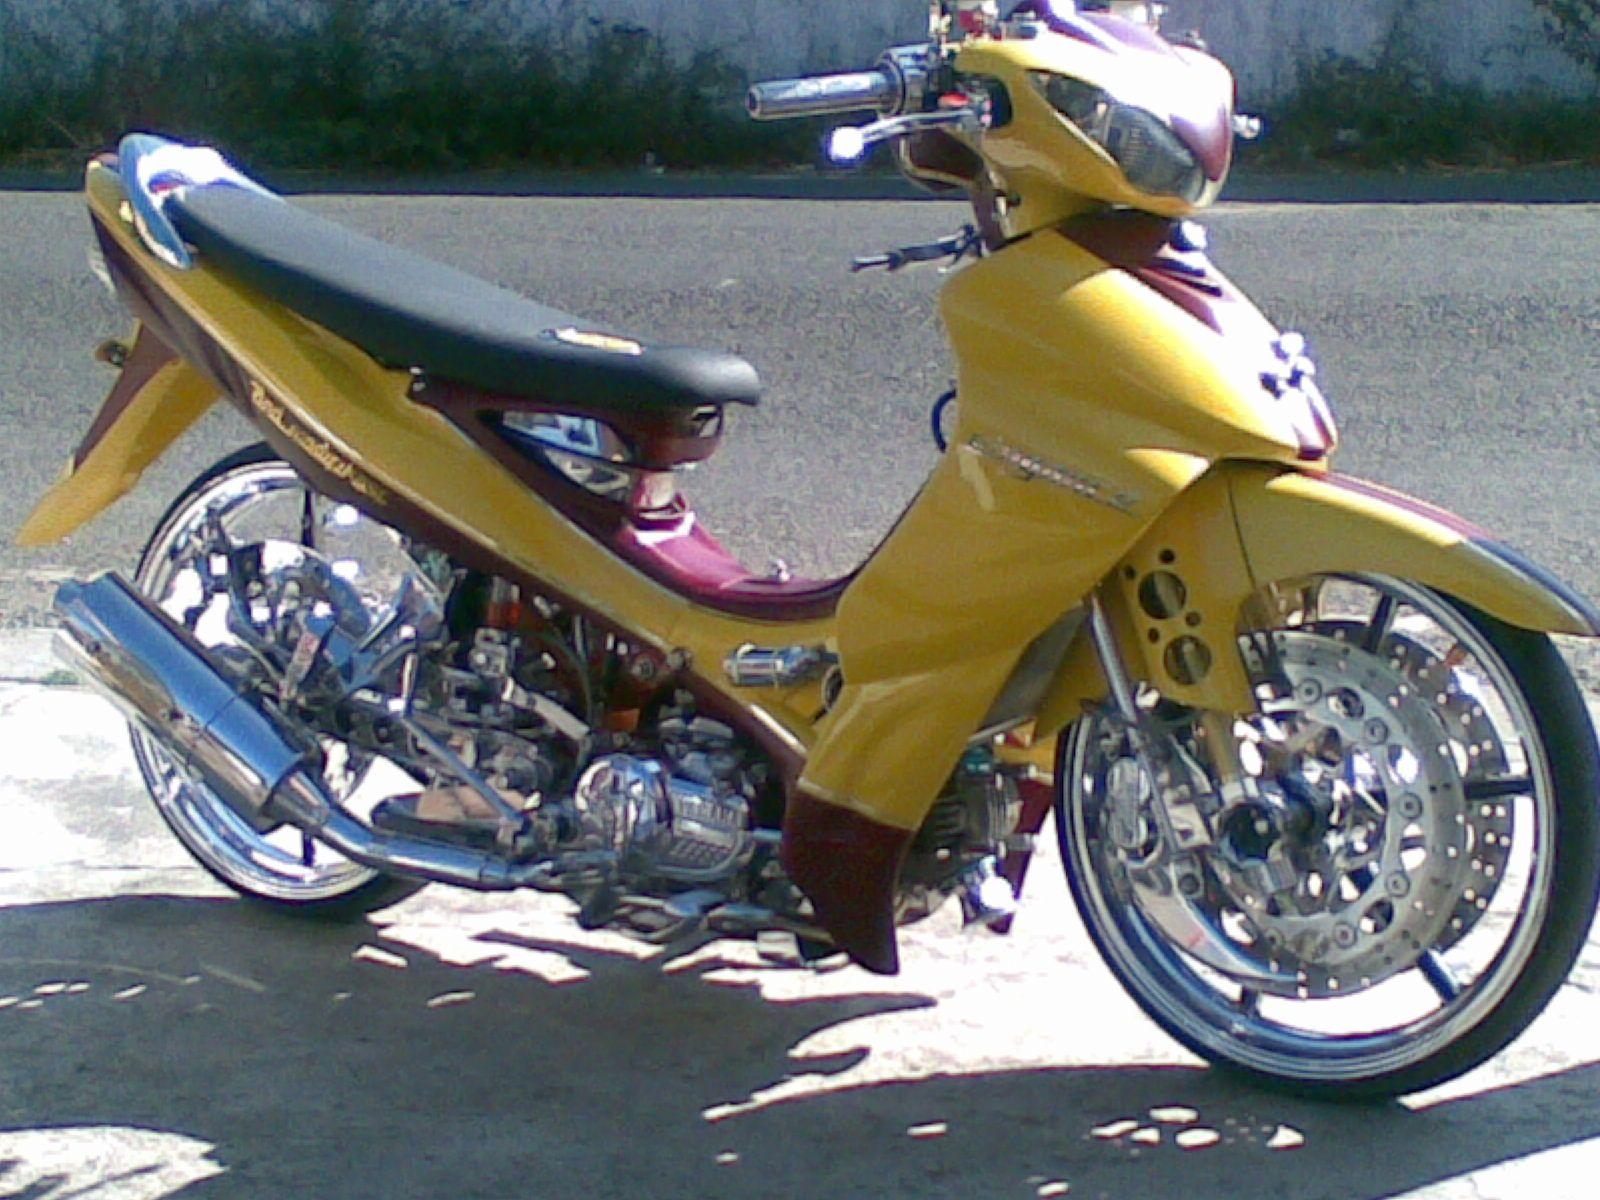 Punya motor jupiter z modifikasi sulapnya seperti ini kunci punya motor jupiter z modifikasi sulapnya seperti ini ccuart Image collections